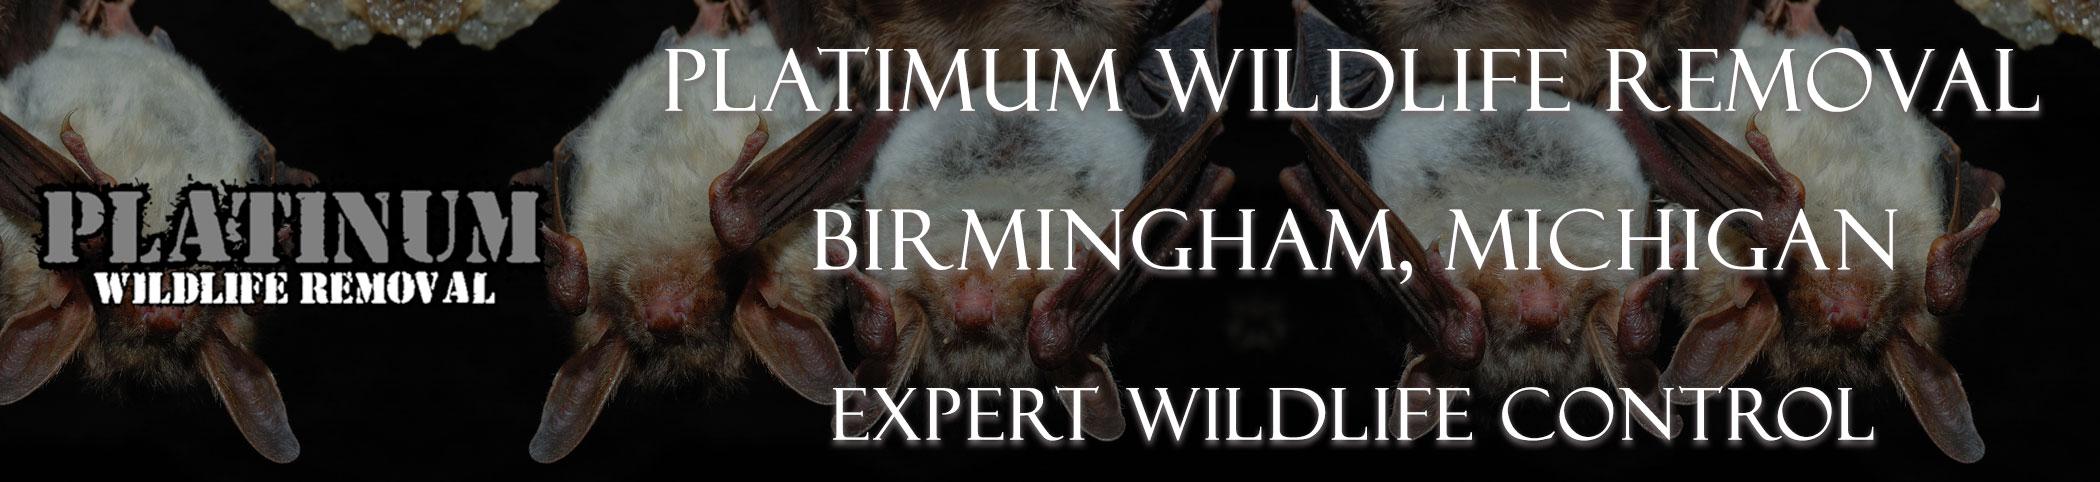 Birmingham-Platinum-Wildlife-Removal-michgan